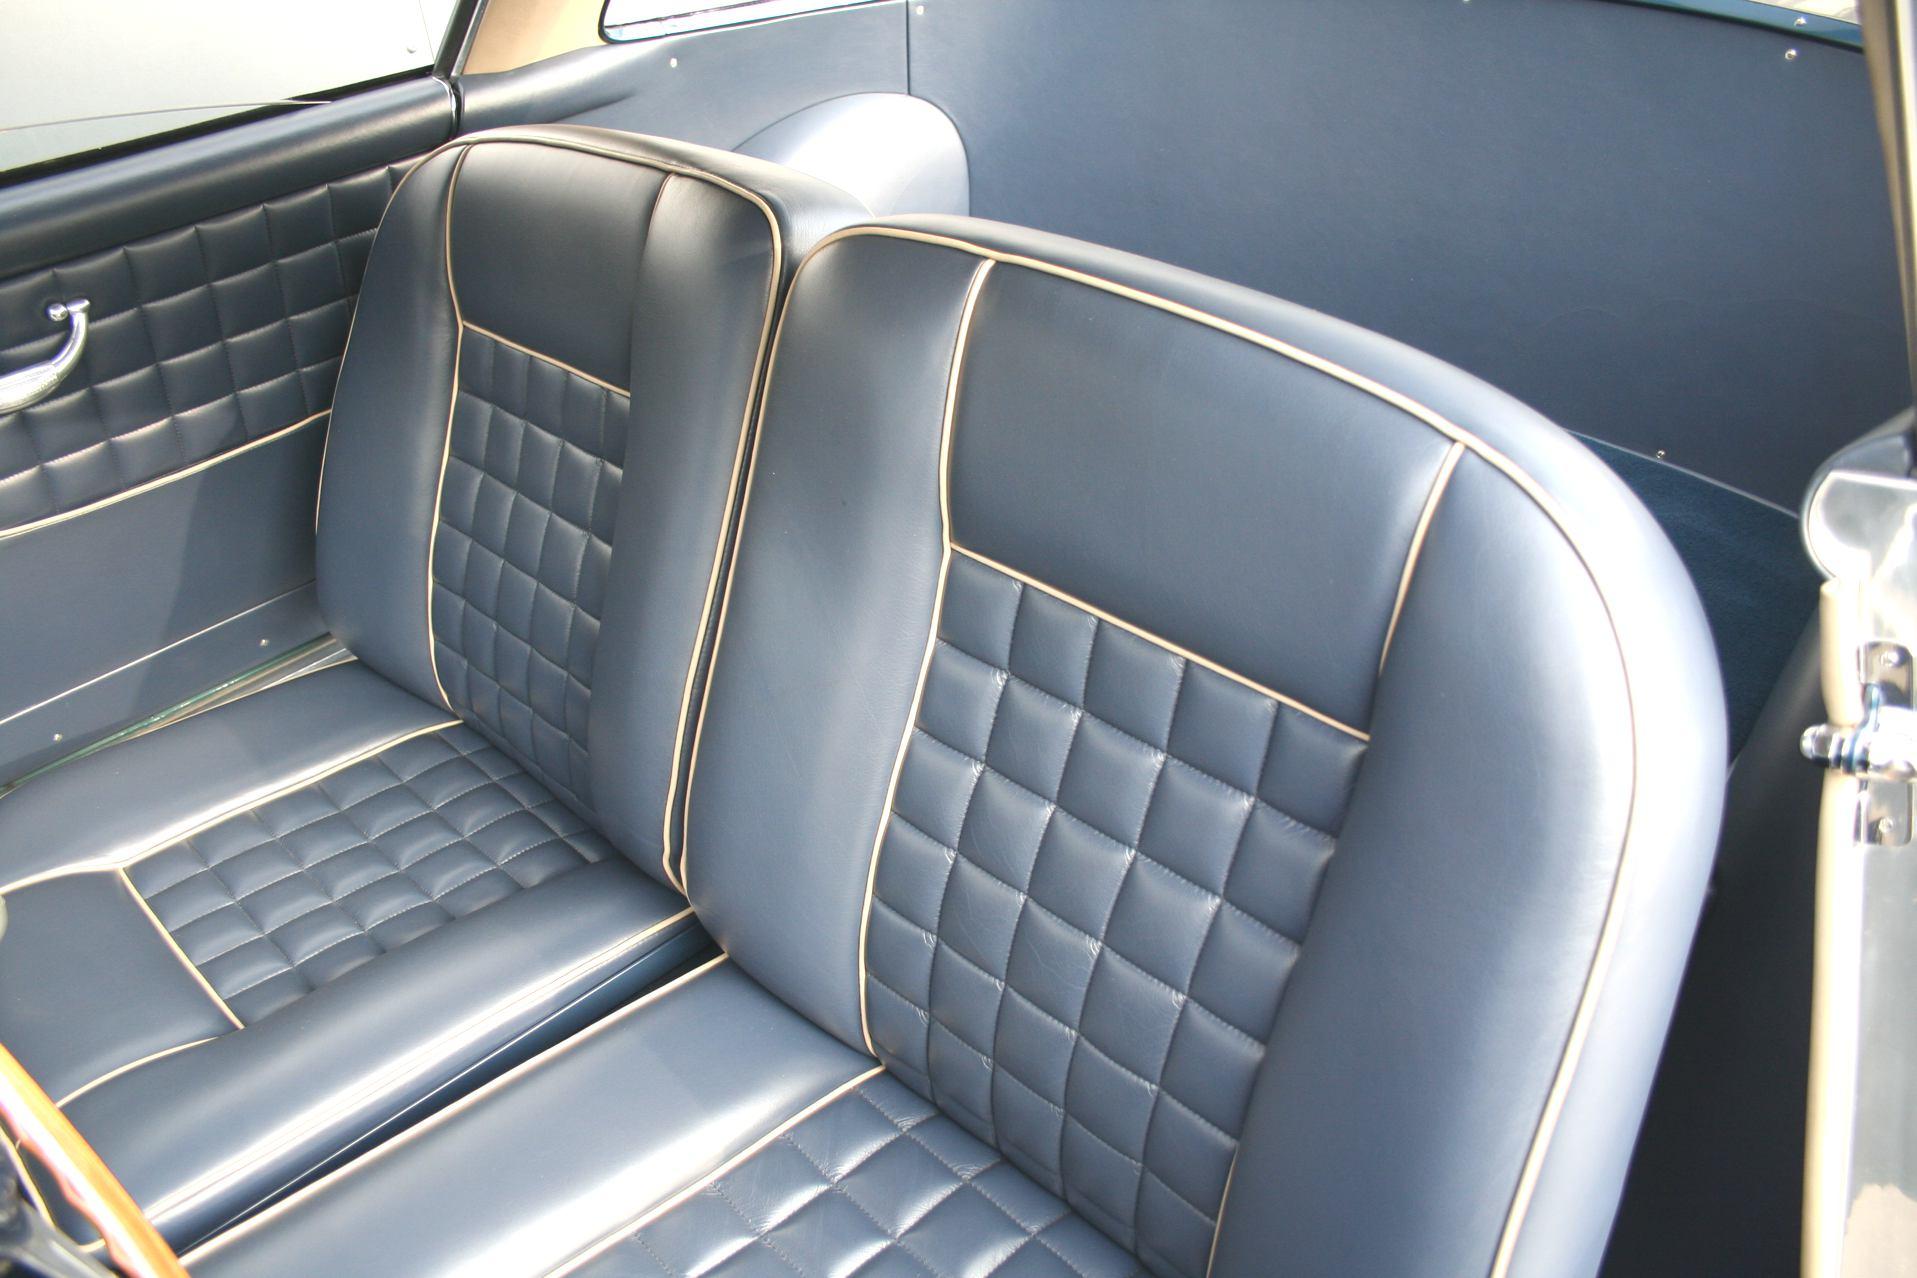 1953-Vignale-Fiat-8V-Interior-02